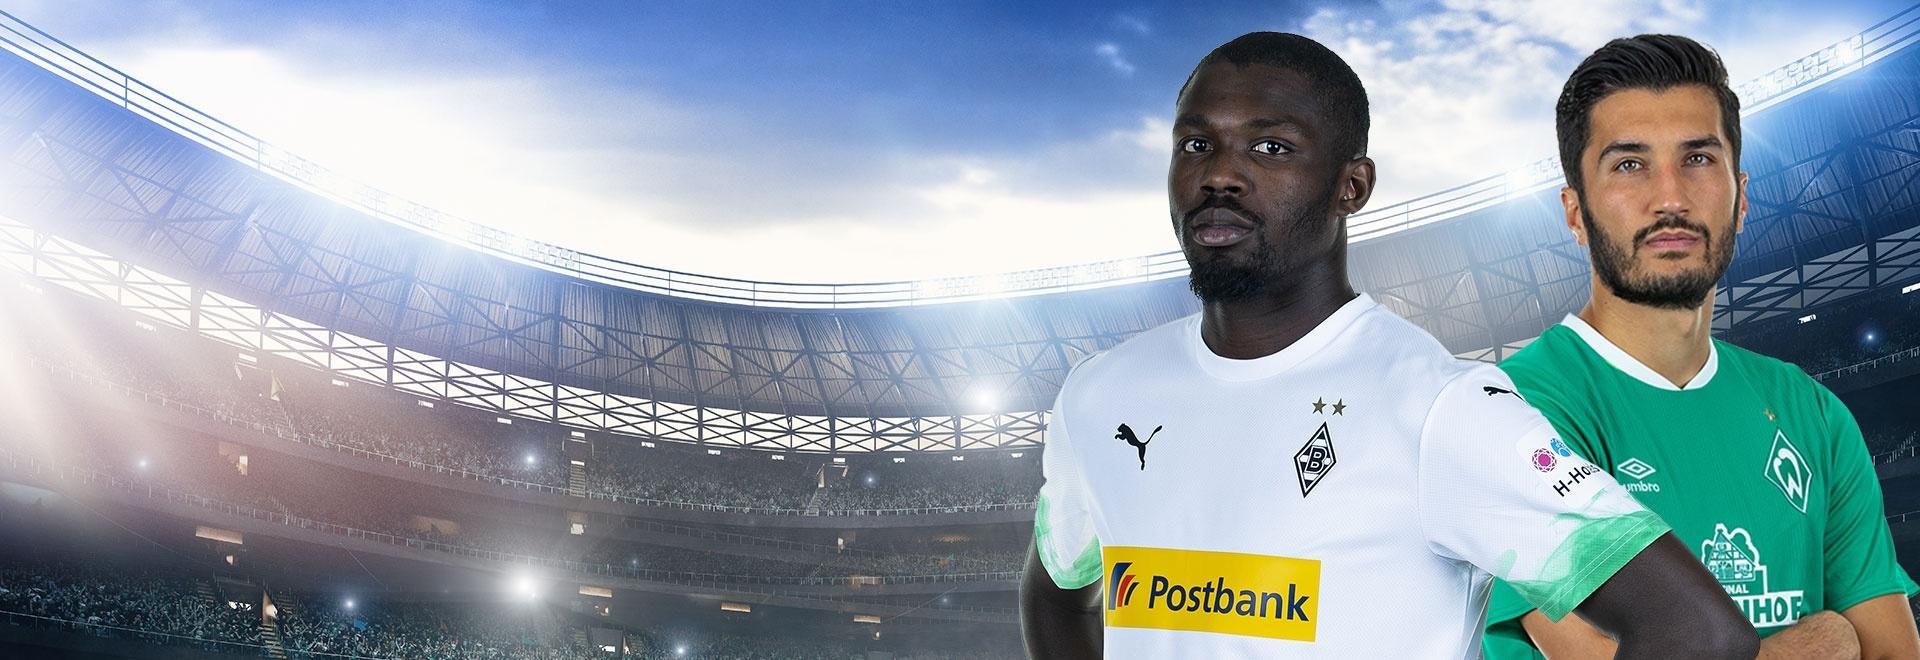 Borussia M. - Werder Brema. 11a g.